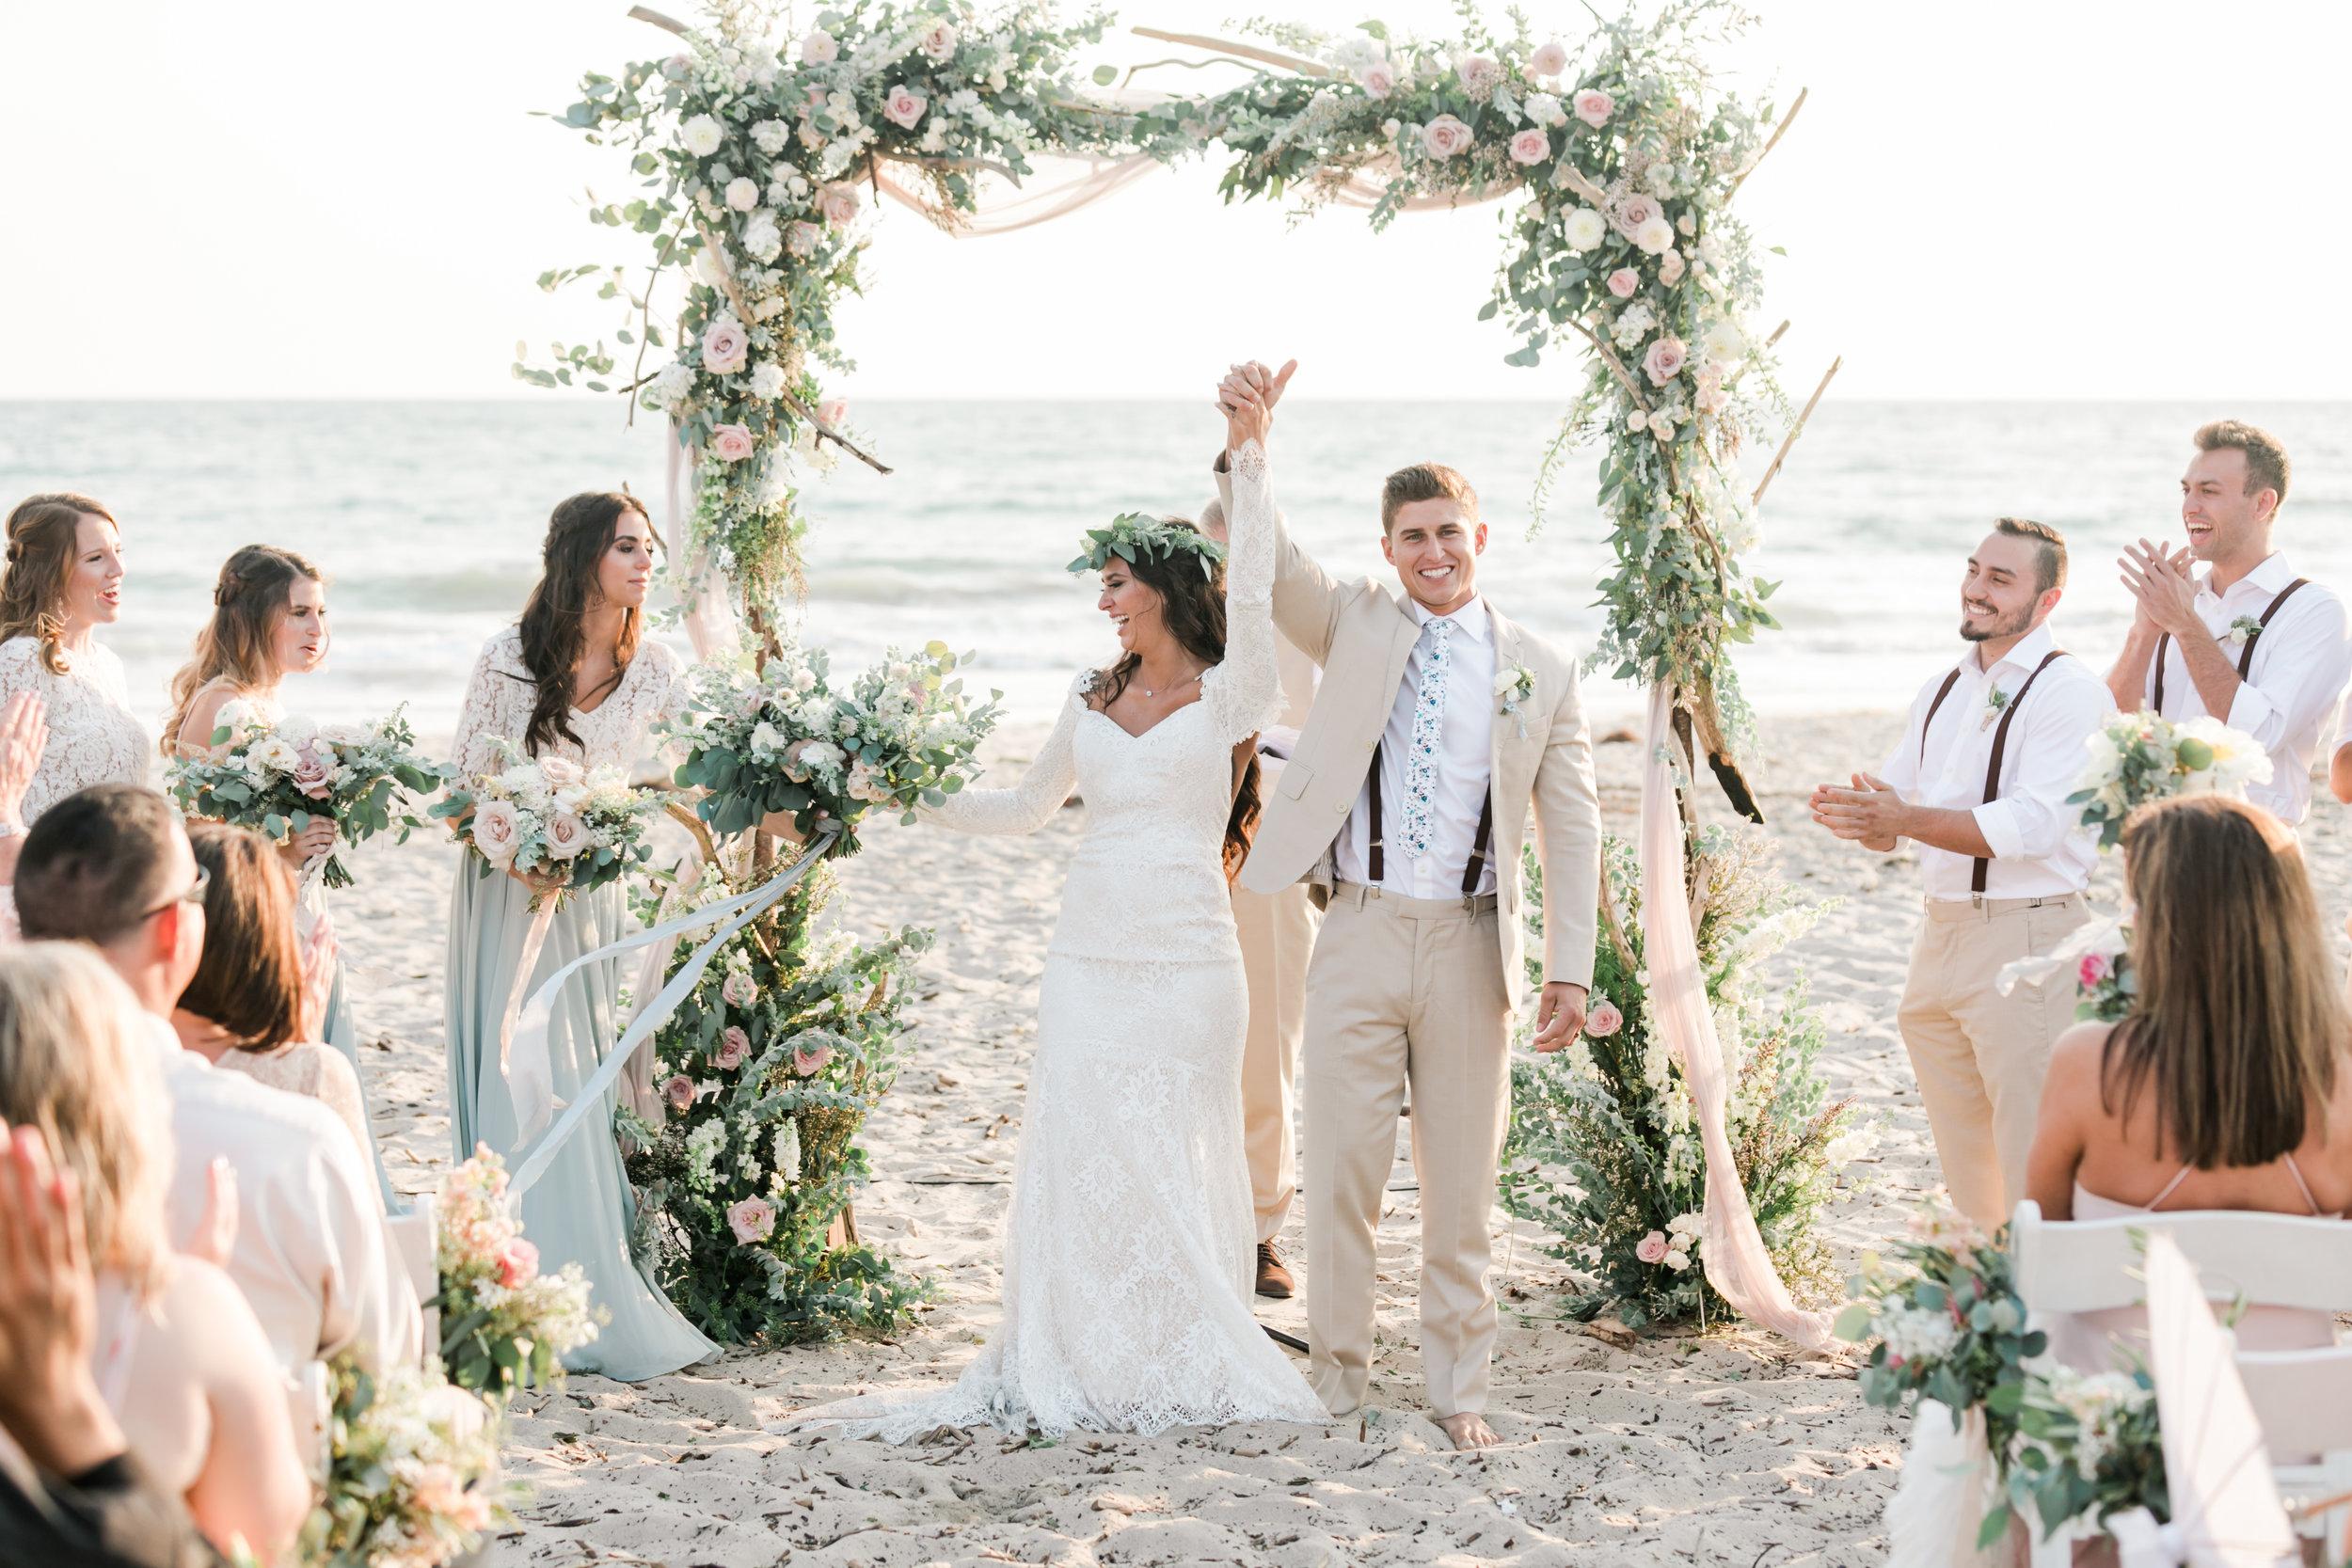 Destination Beach Wedding_Valorie Darling Photography-2310.jpg